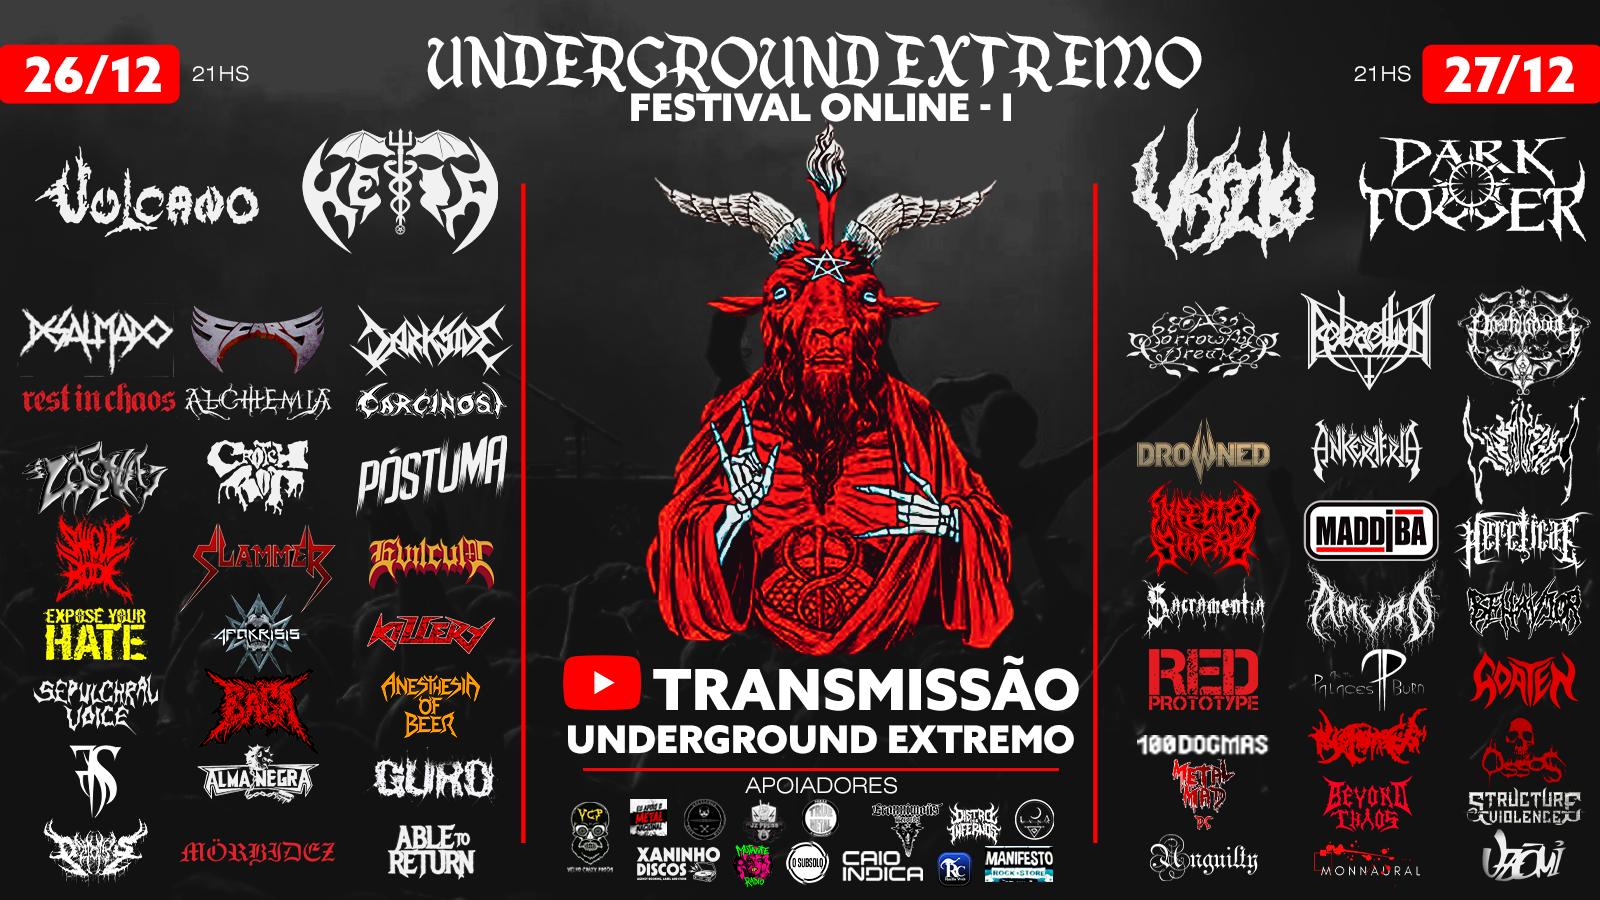 POSTUMA_Undergroun_Extremo_Festival_Cartaz.png